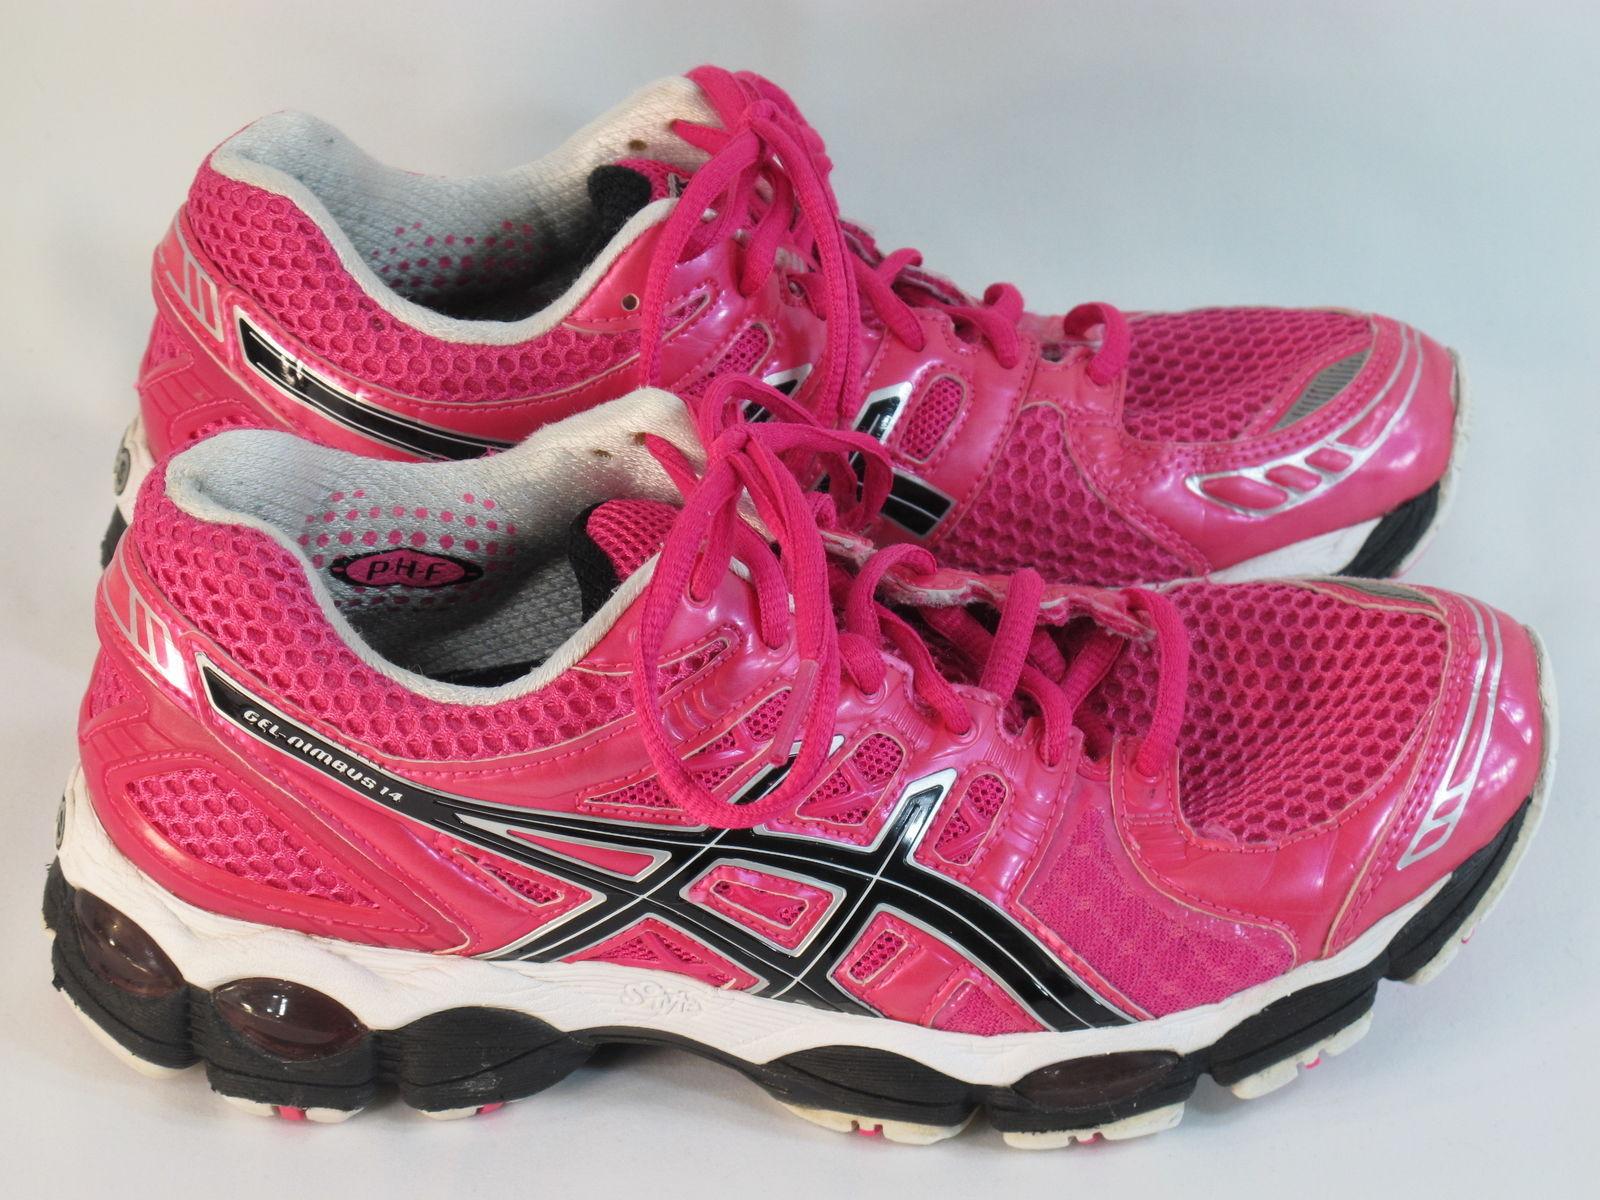 99ad43b3 ASICS Gel Nimbus 14 Running Shoes Women's and 50 similar items